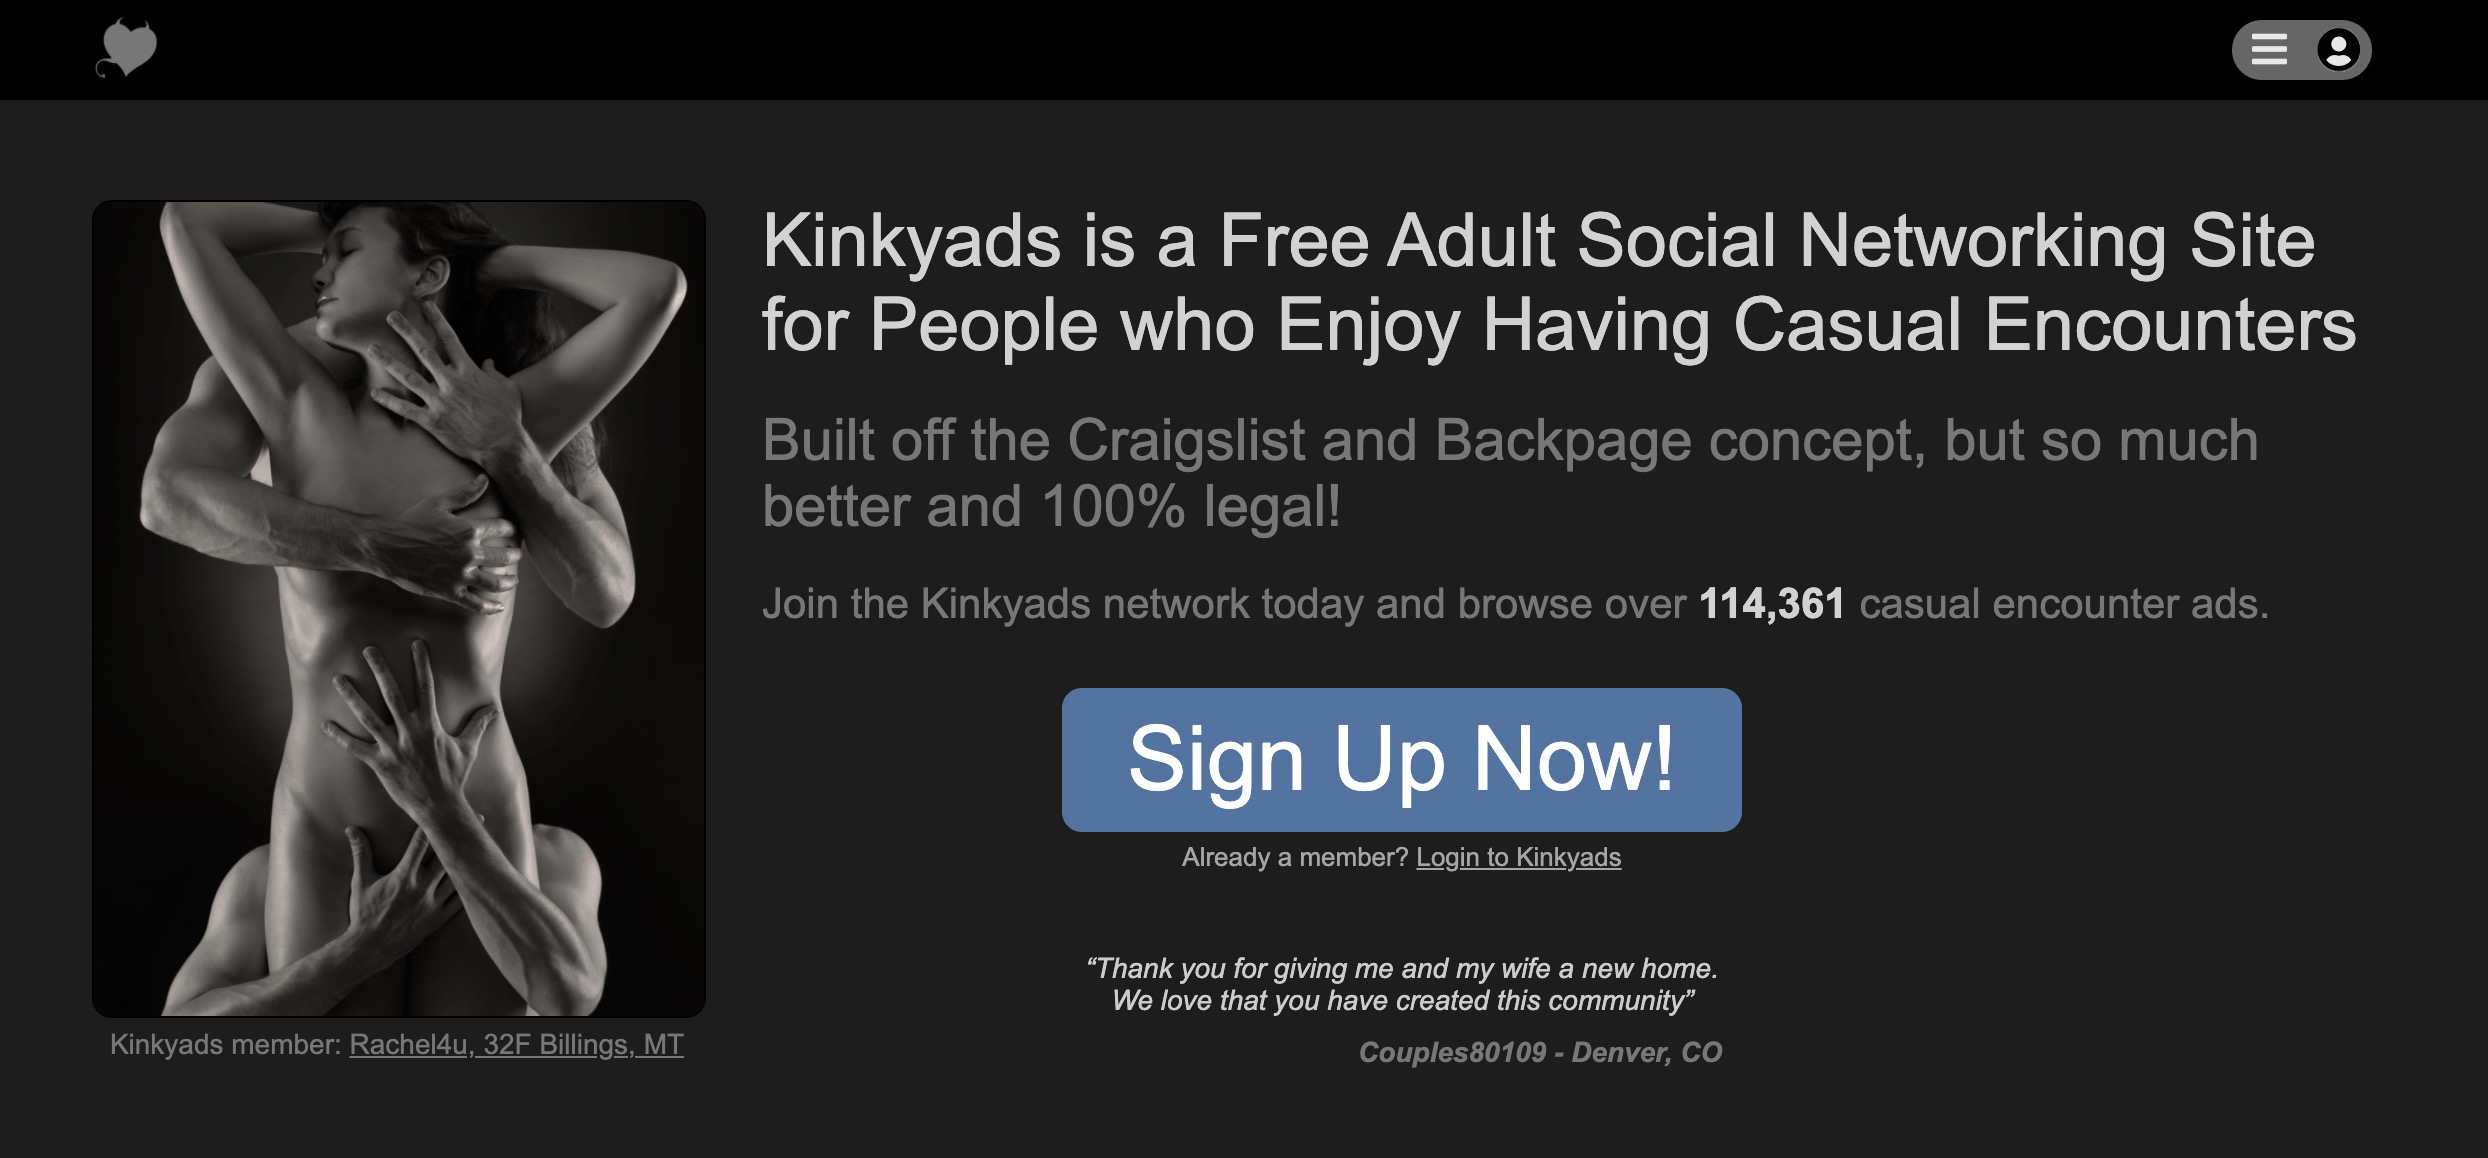 KinkyAds main page